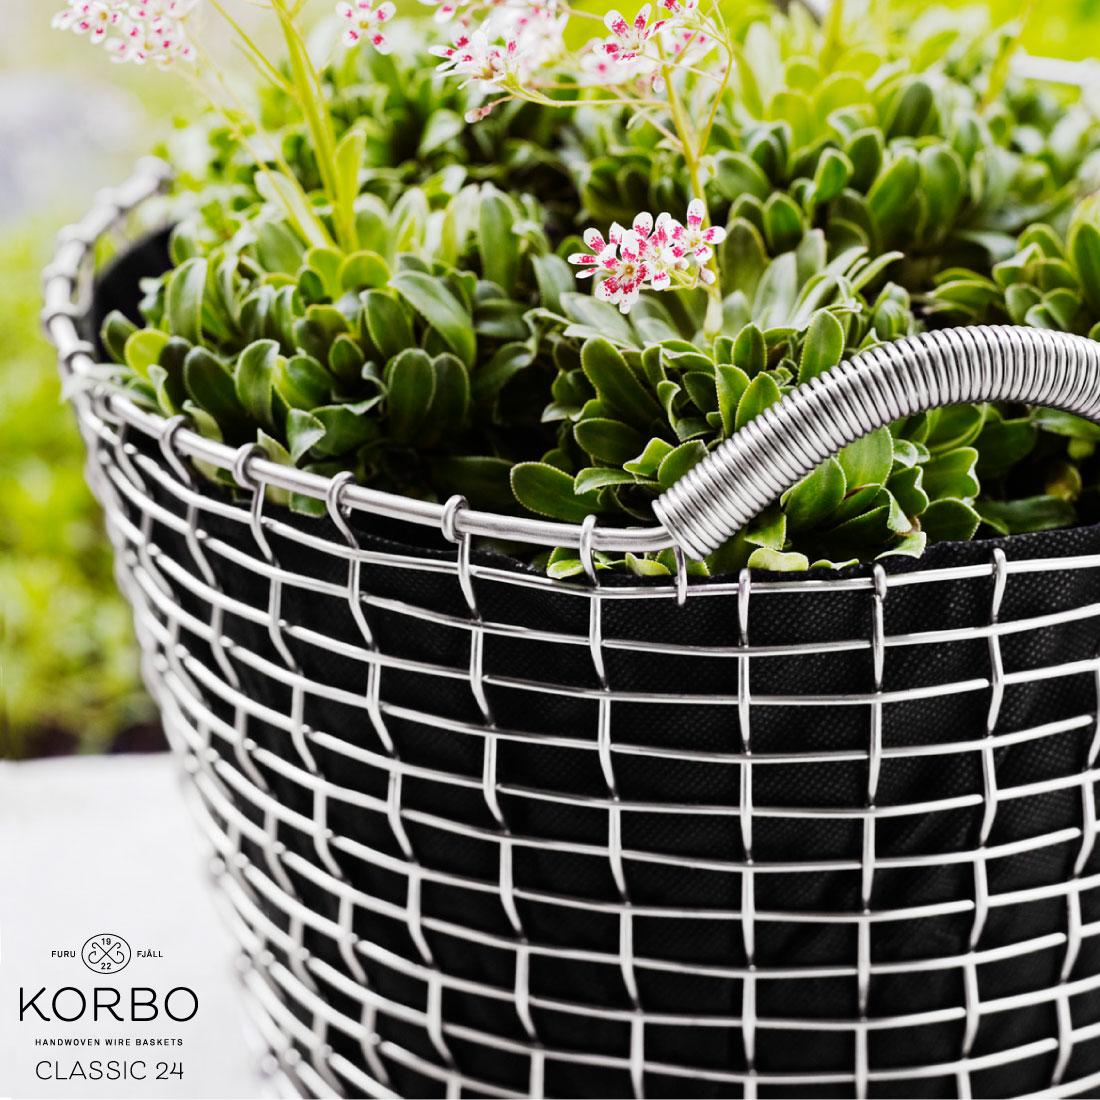 【KORBO/コルボ】CLASSIC24 ワイヤーバスケット手織り/スウェーデン/北欧/カゴ/ステンレス日本正規代理店品